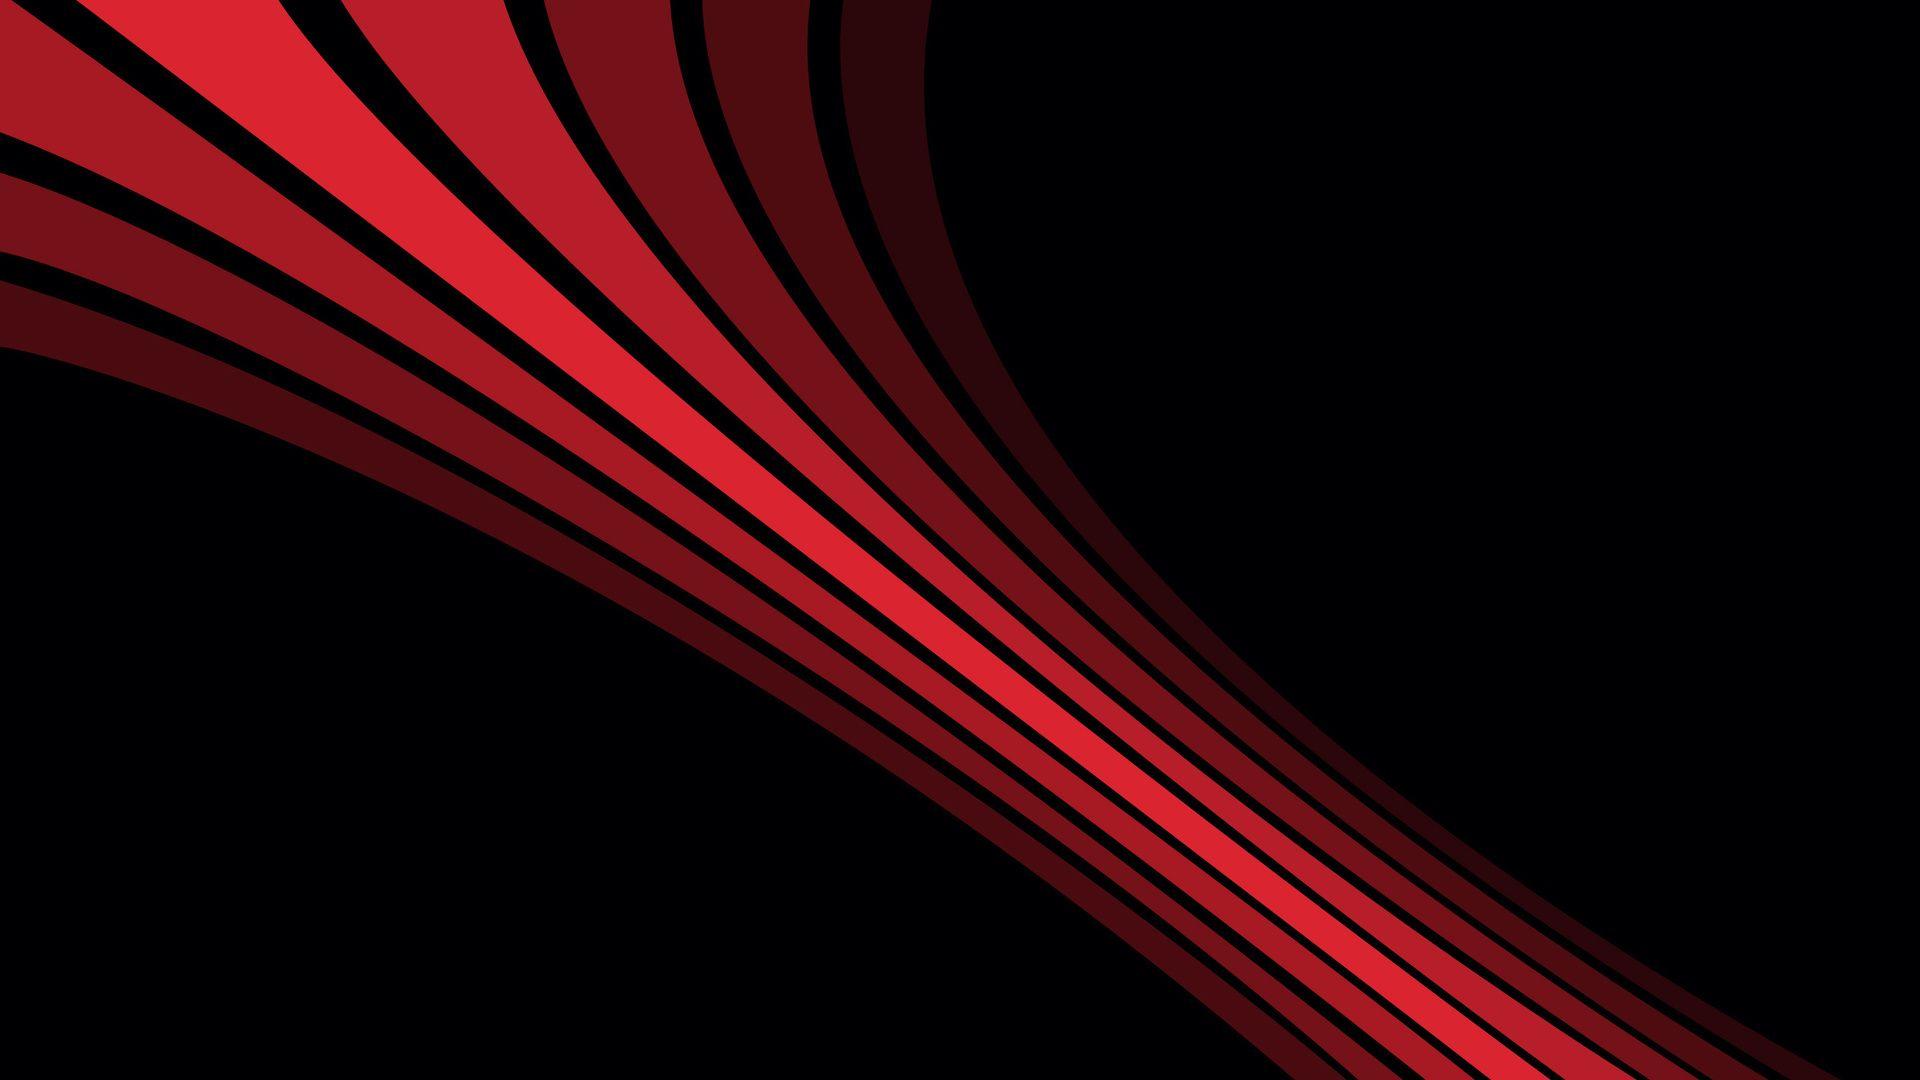 hd wallpaper black red | 3d-hd wallpaper | pinterest | hd wallpaper